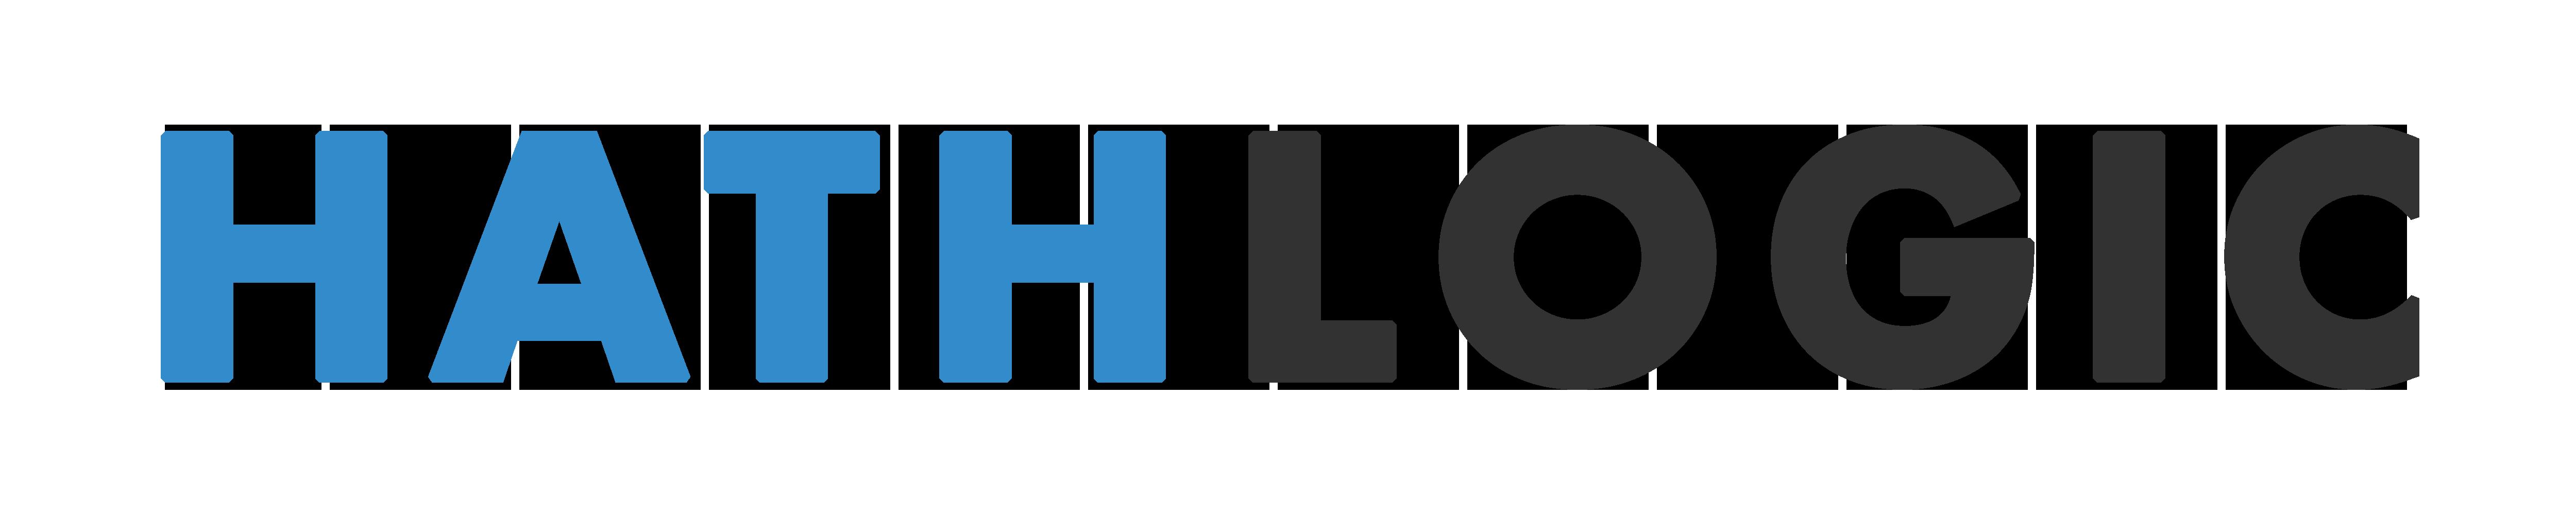 Hathlogic Logo